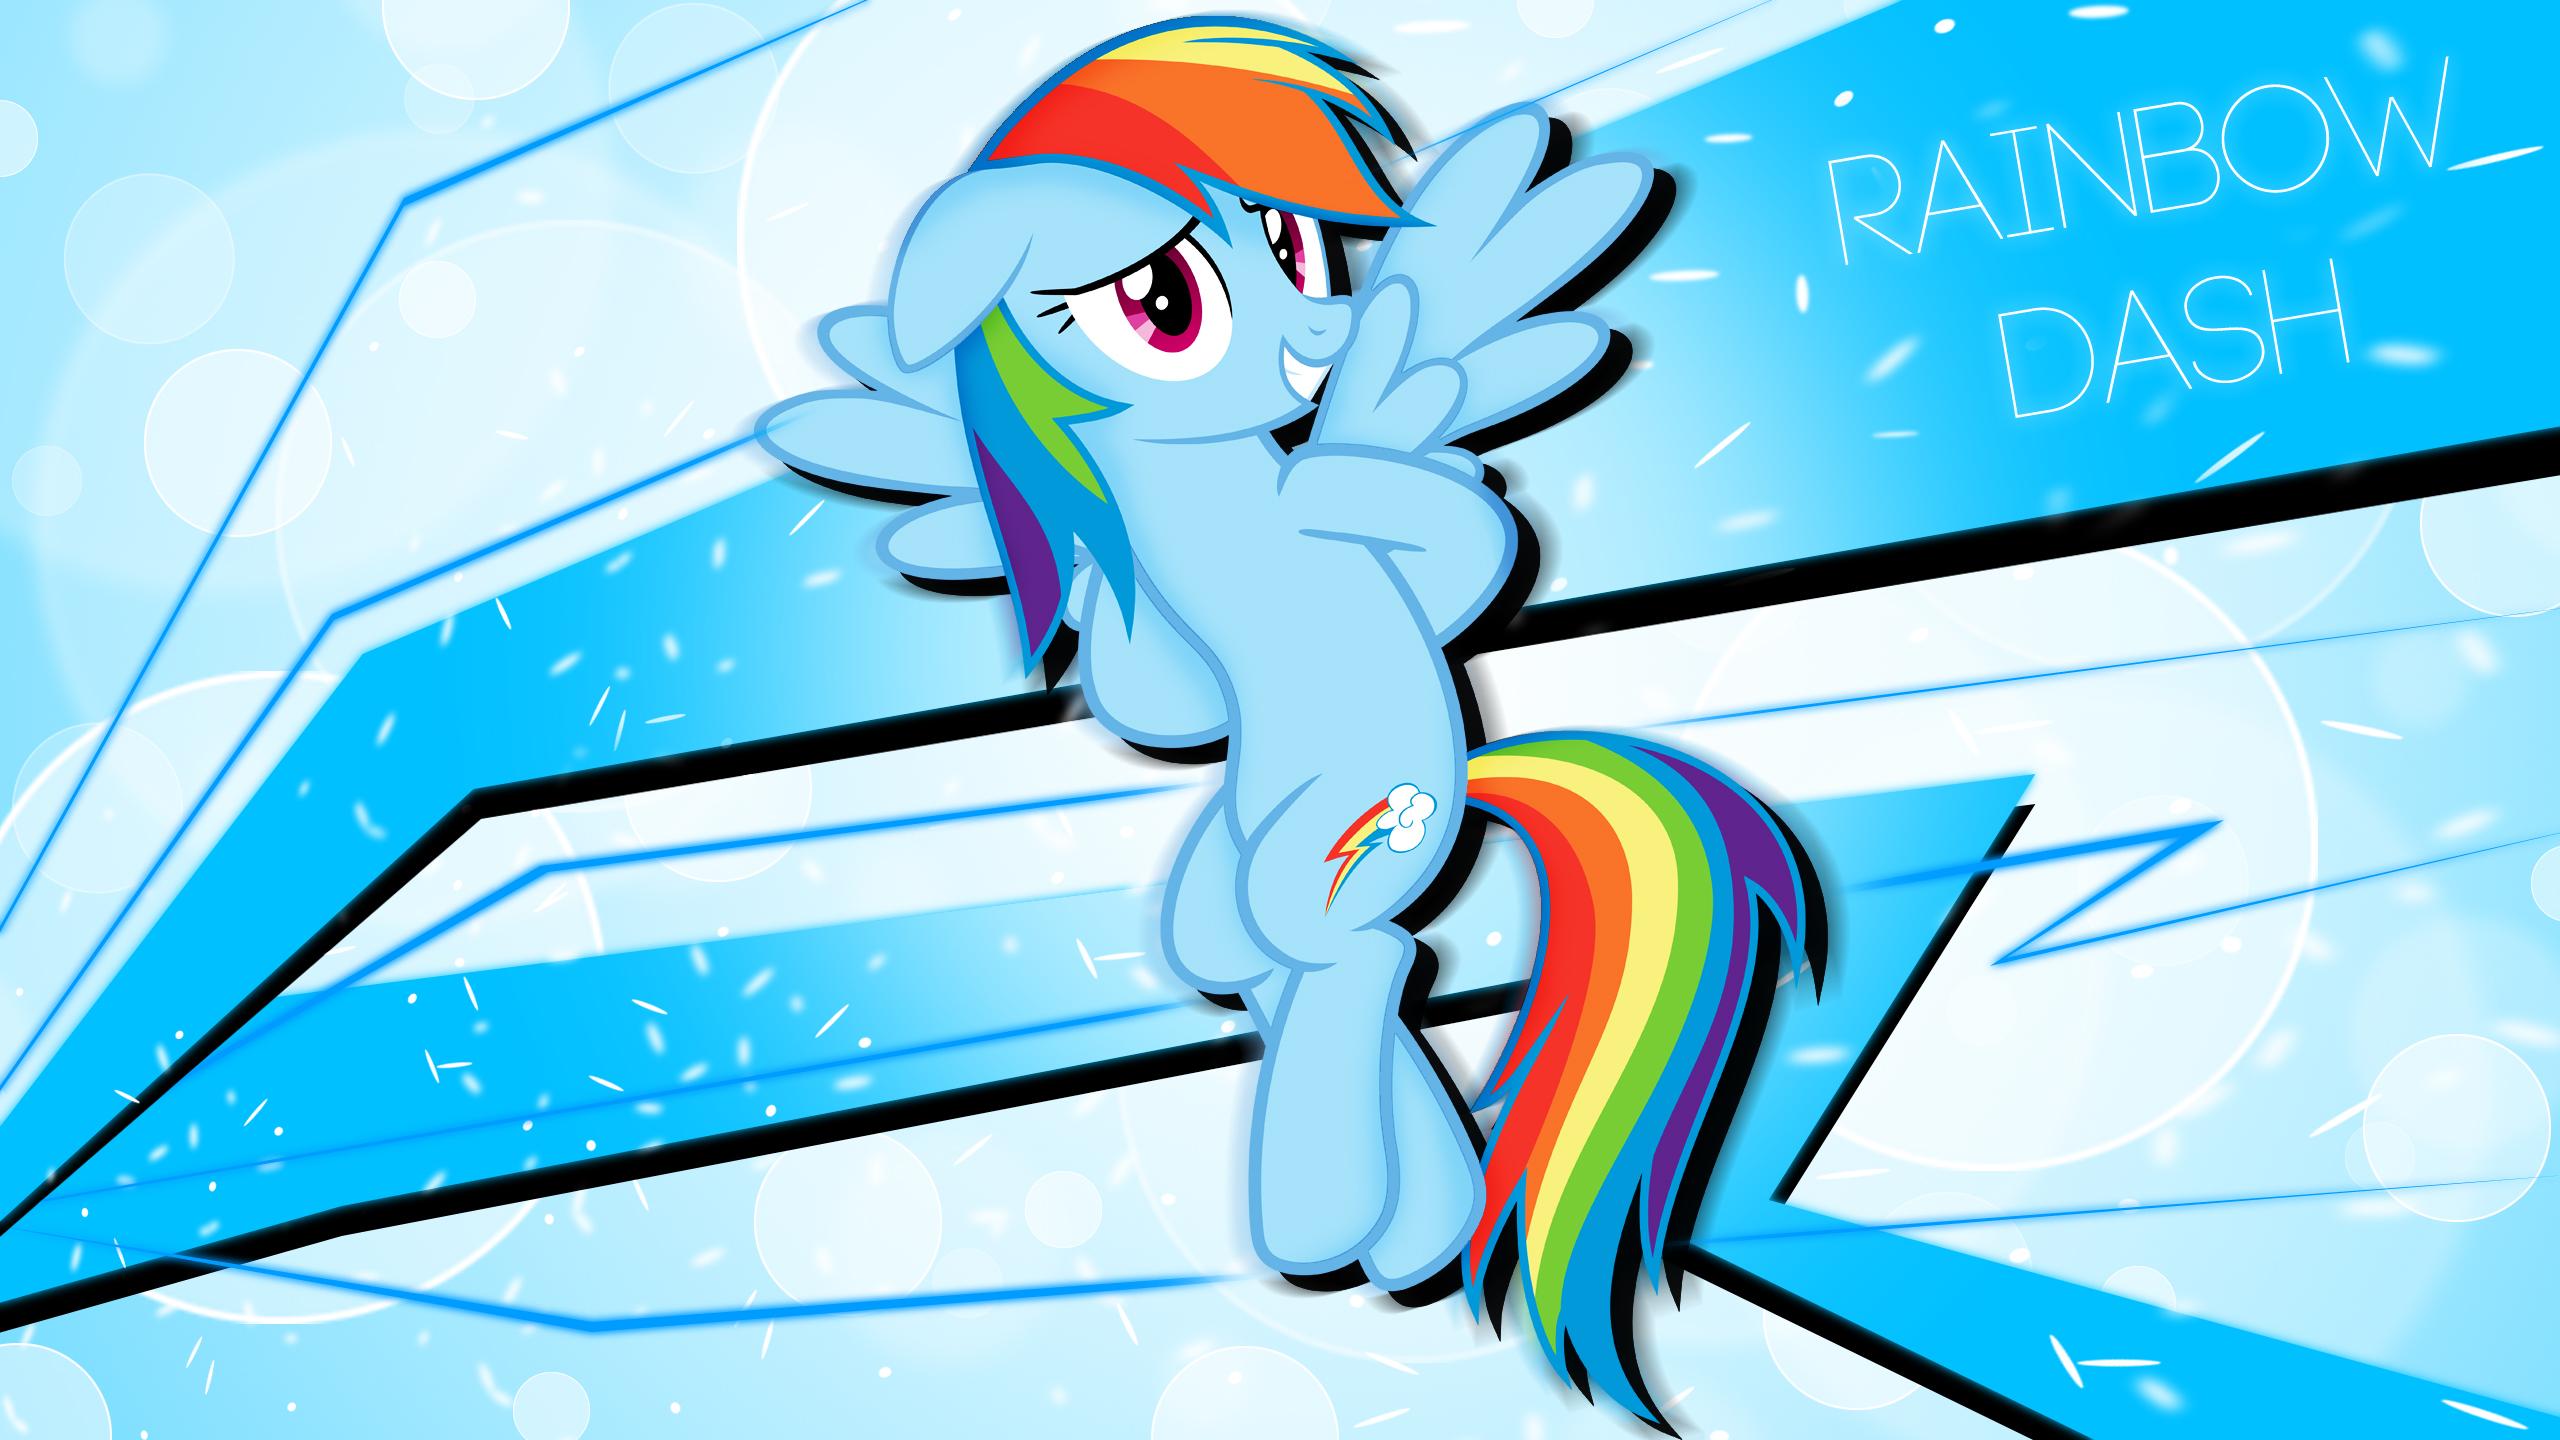 Rainbow Dash Wallpaper 1080p